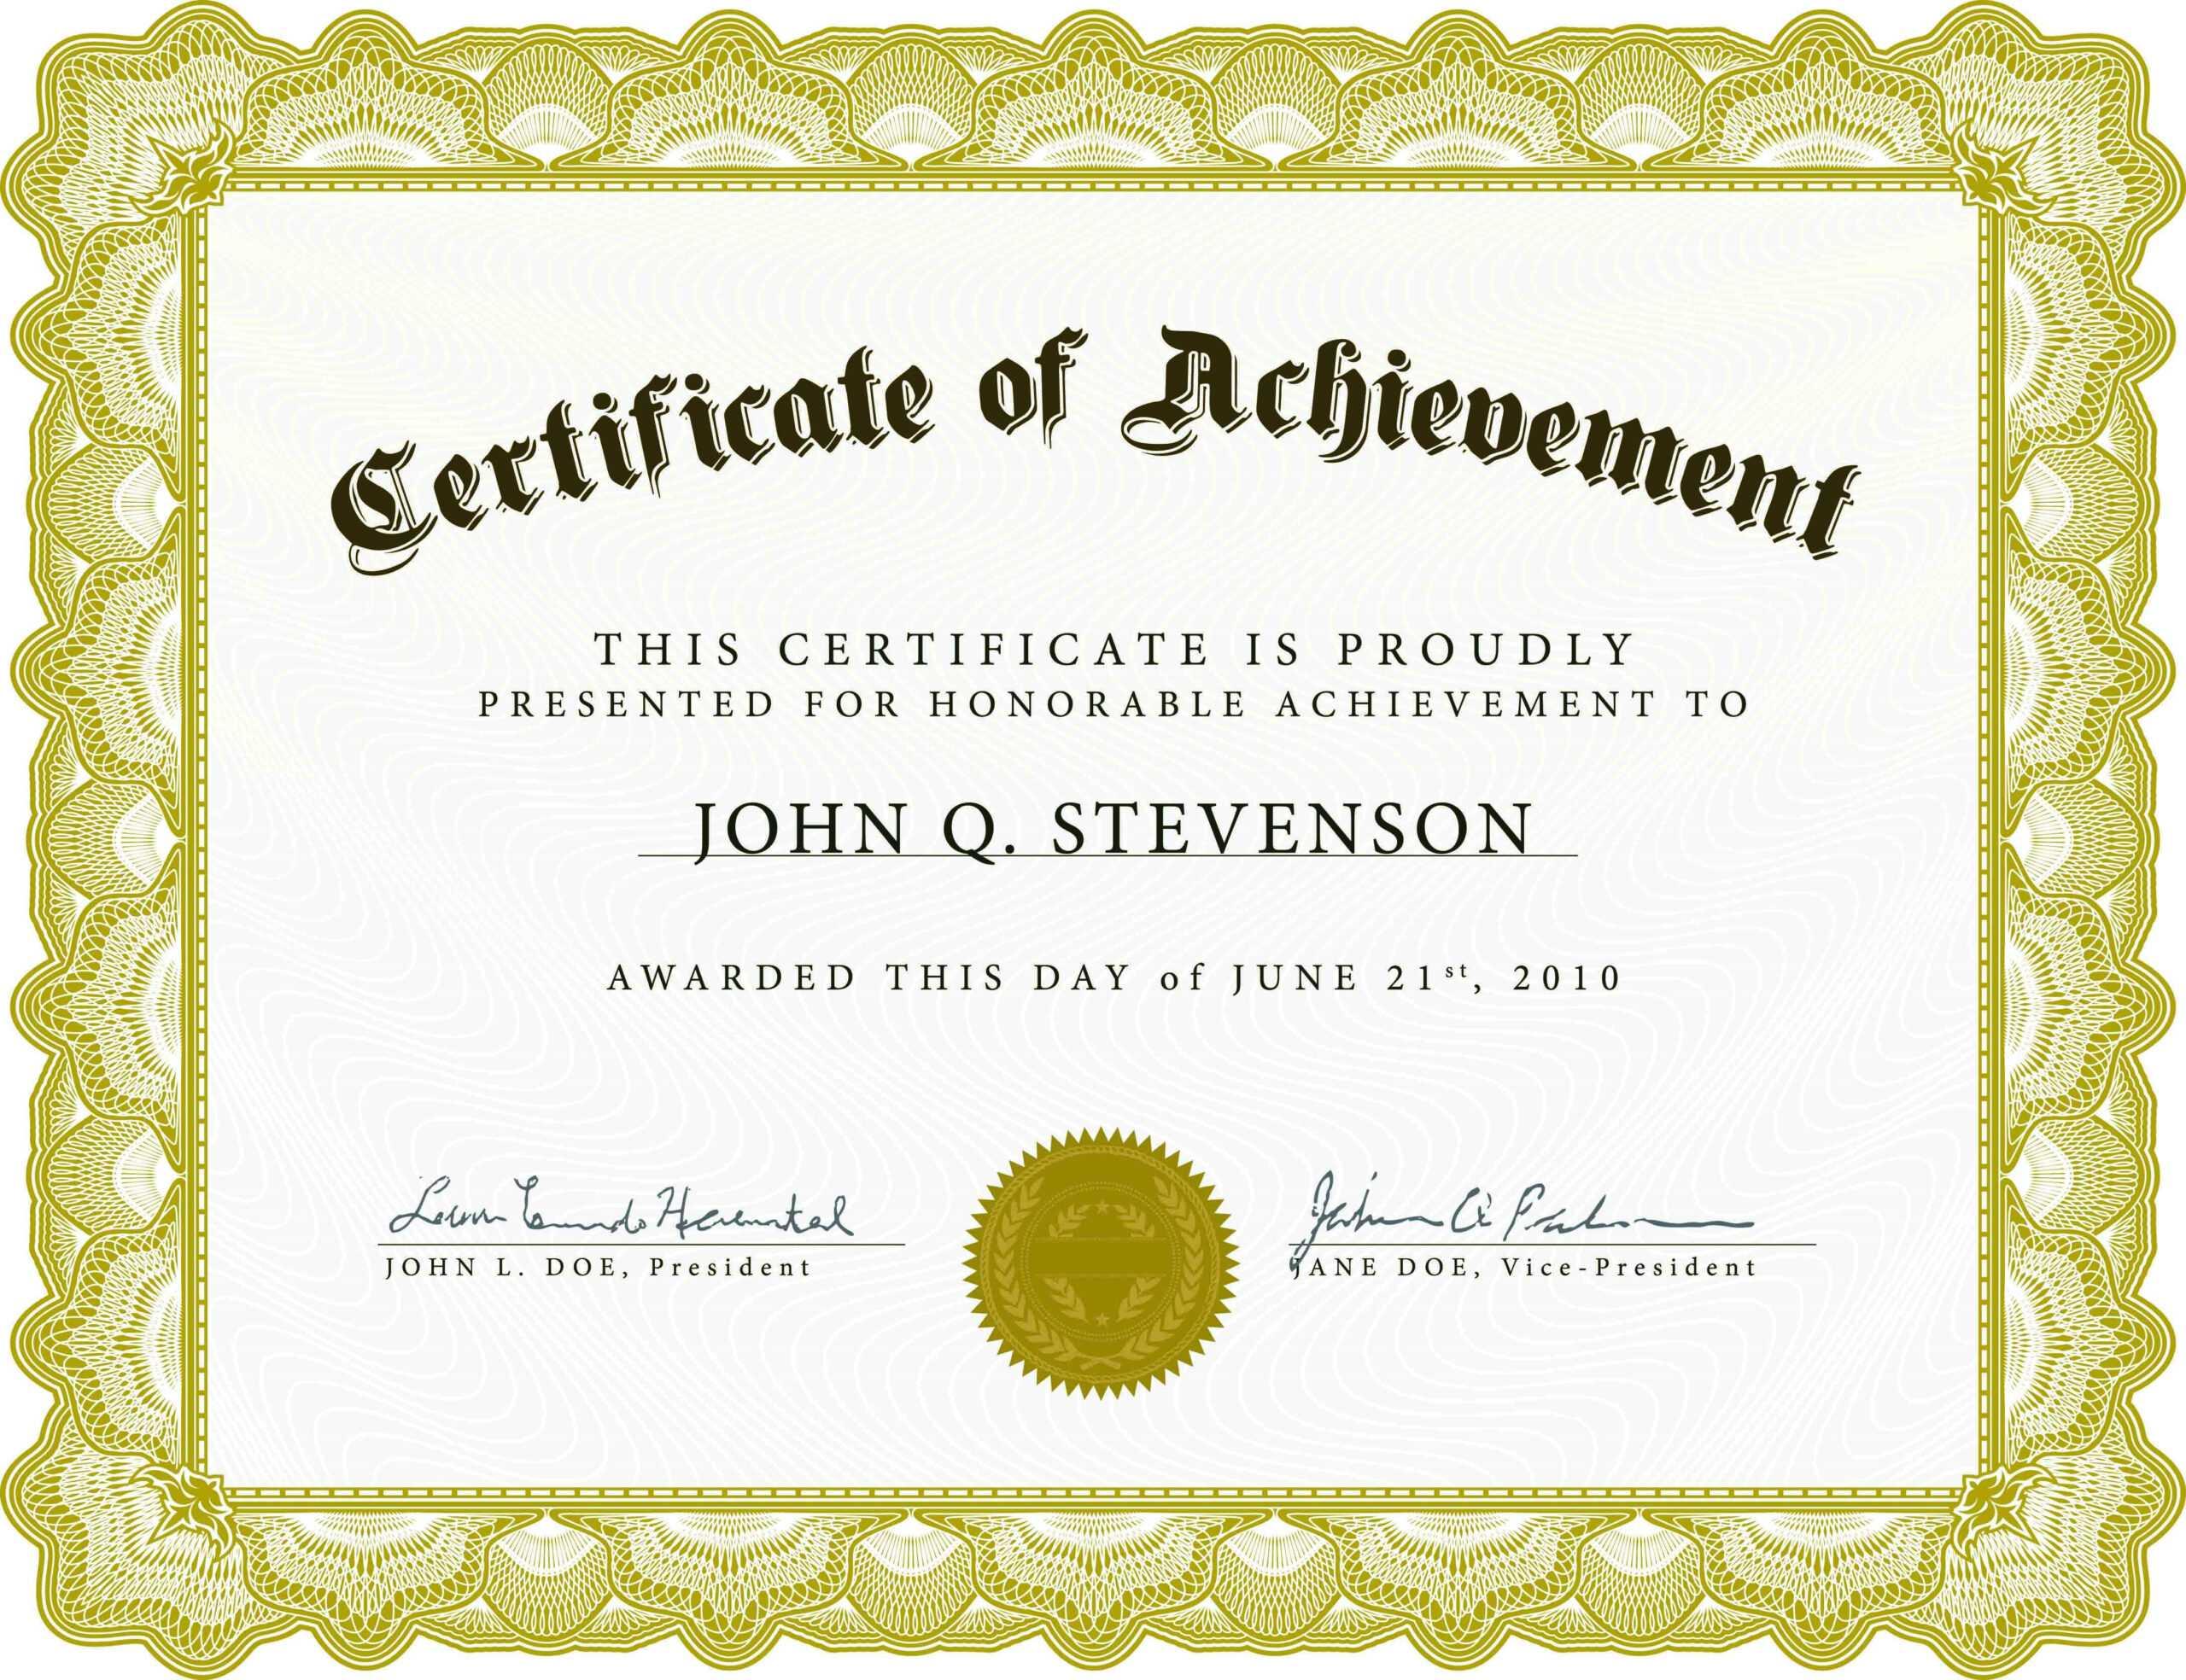 Farewell Certificate Template - Professional Template With Regard To Farewell Certificate Template